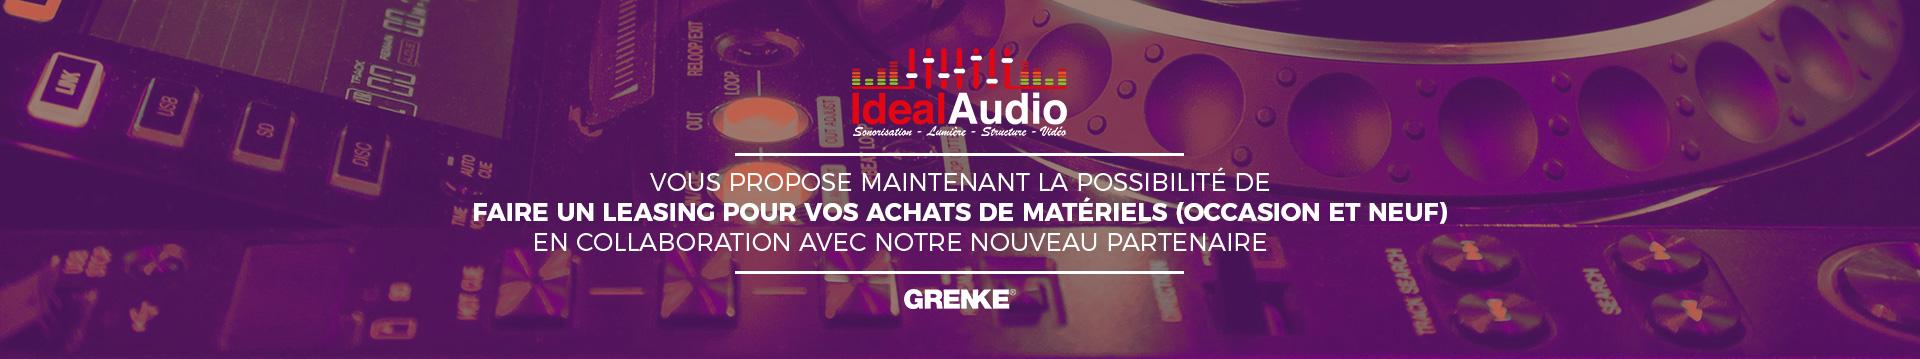 IdealAudio